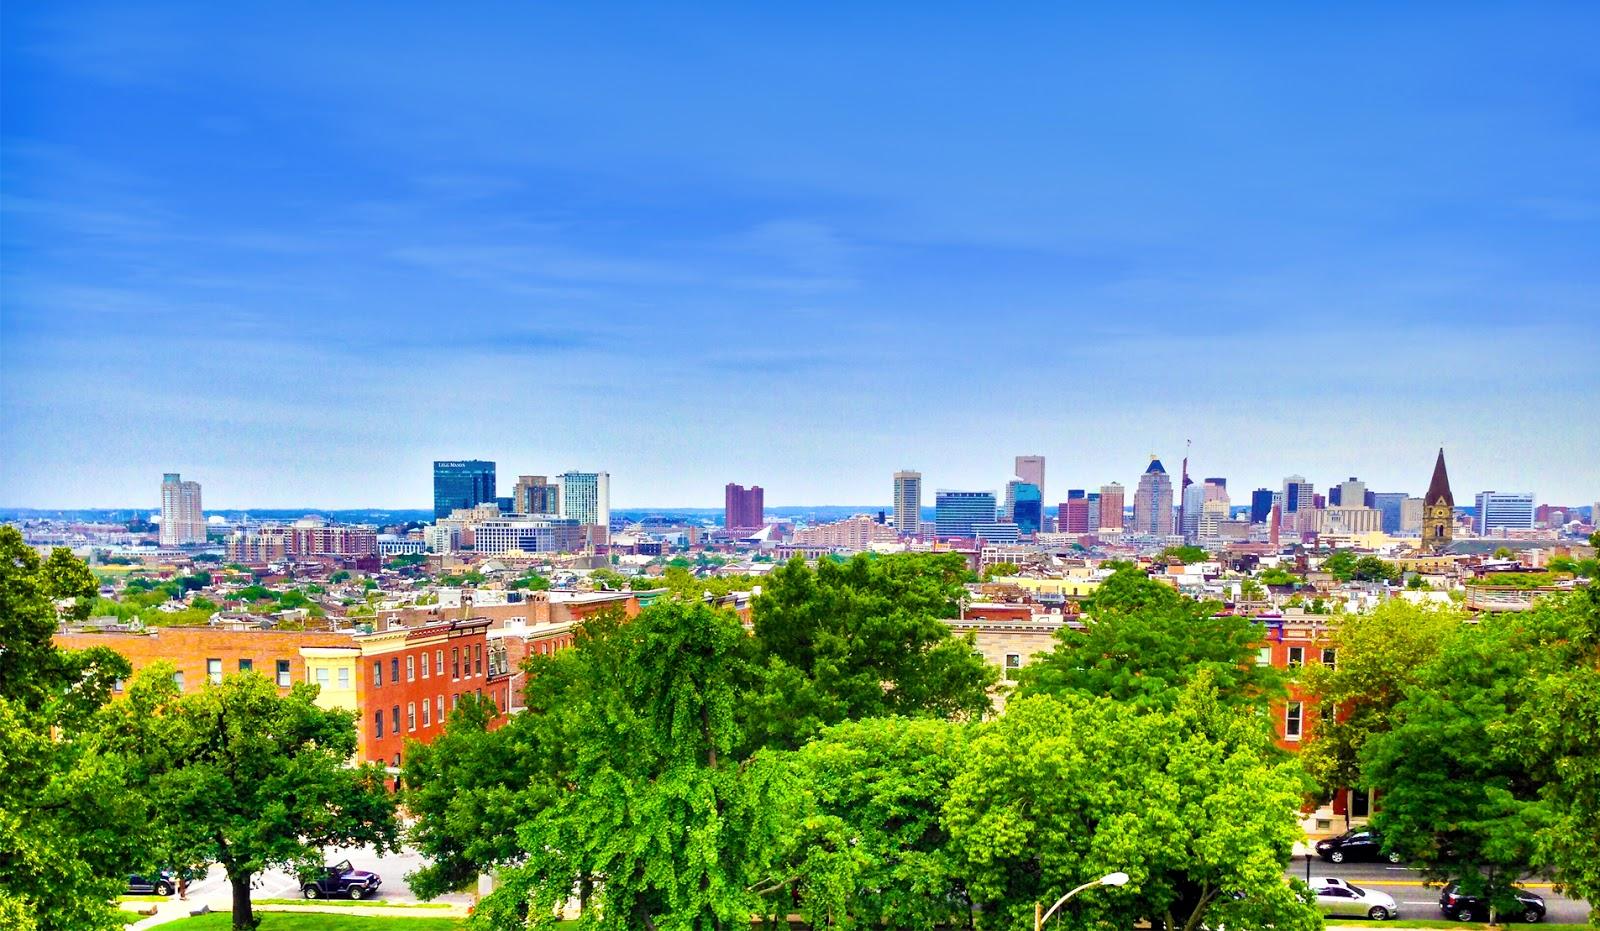 100 ideas Map Usa States Baltimore 2 on emergingartspdxcom